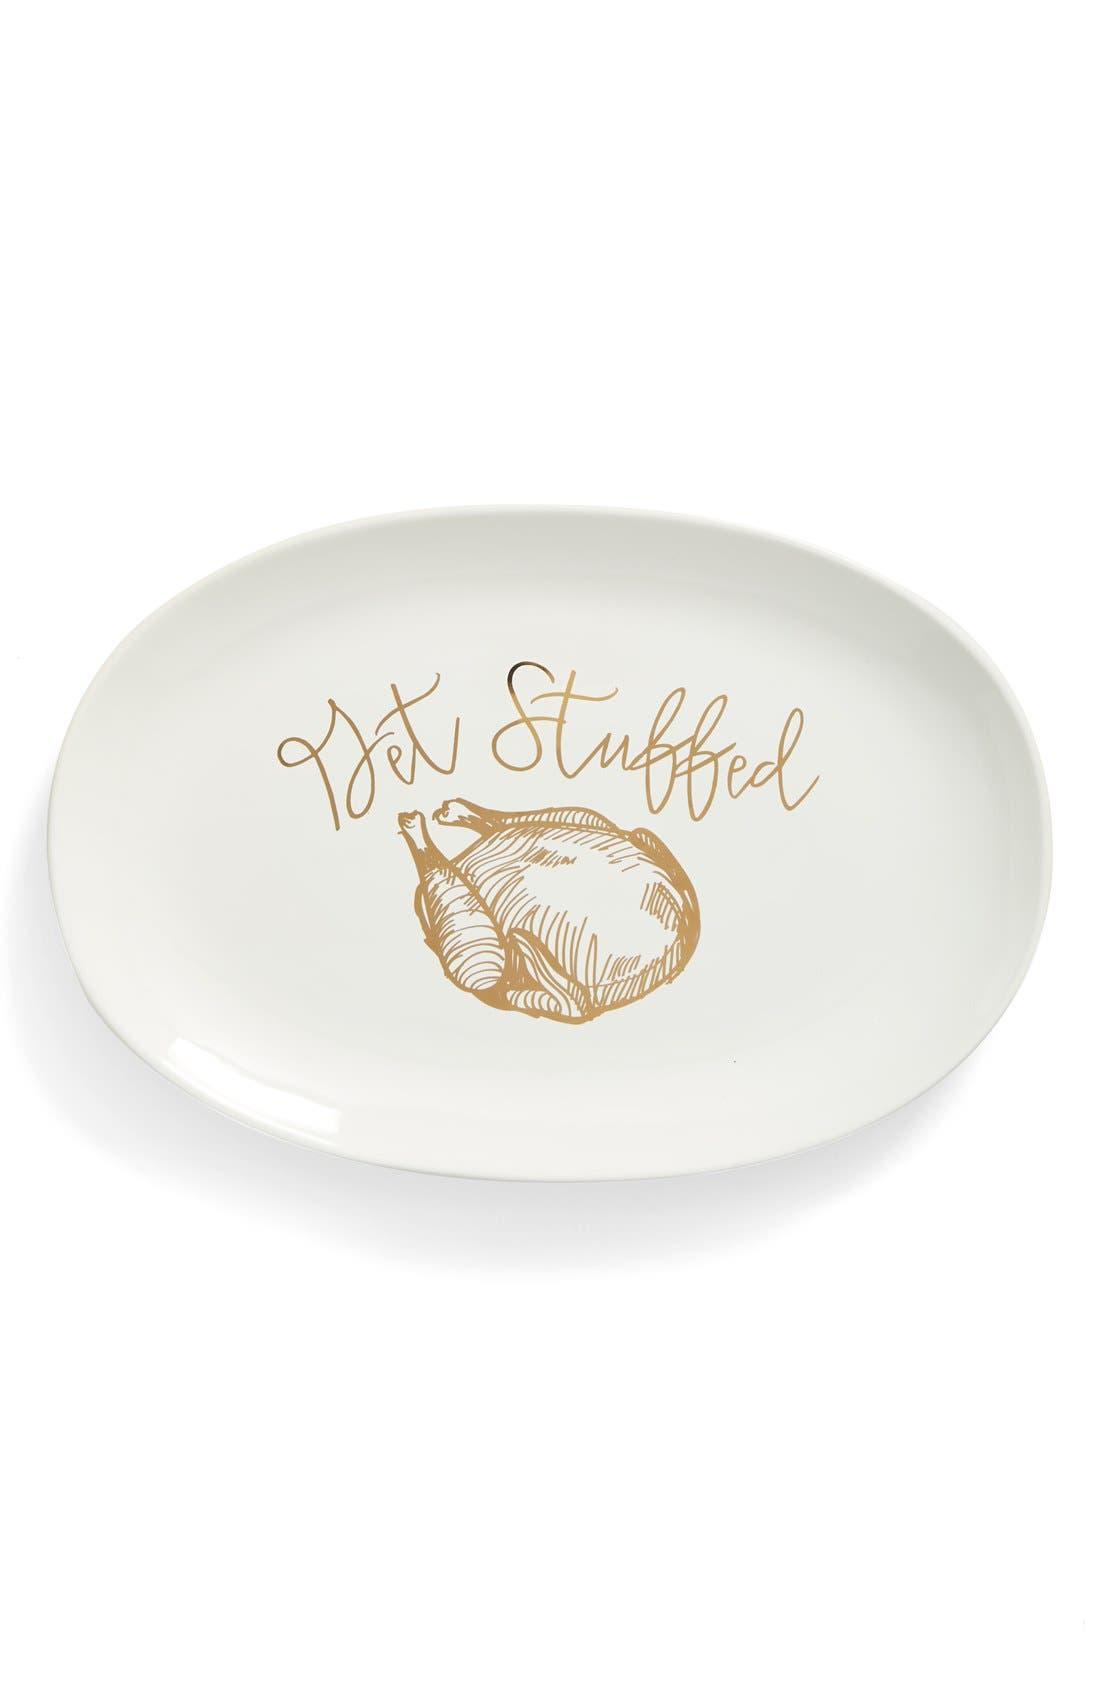 Main Image - Gibson 'Get Stuffed' Stoneware Serving Platter